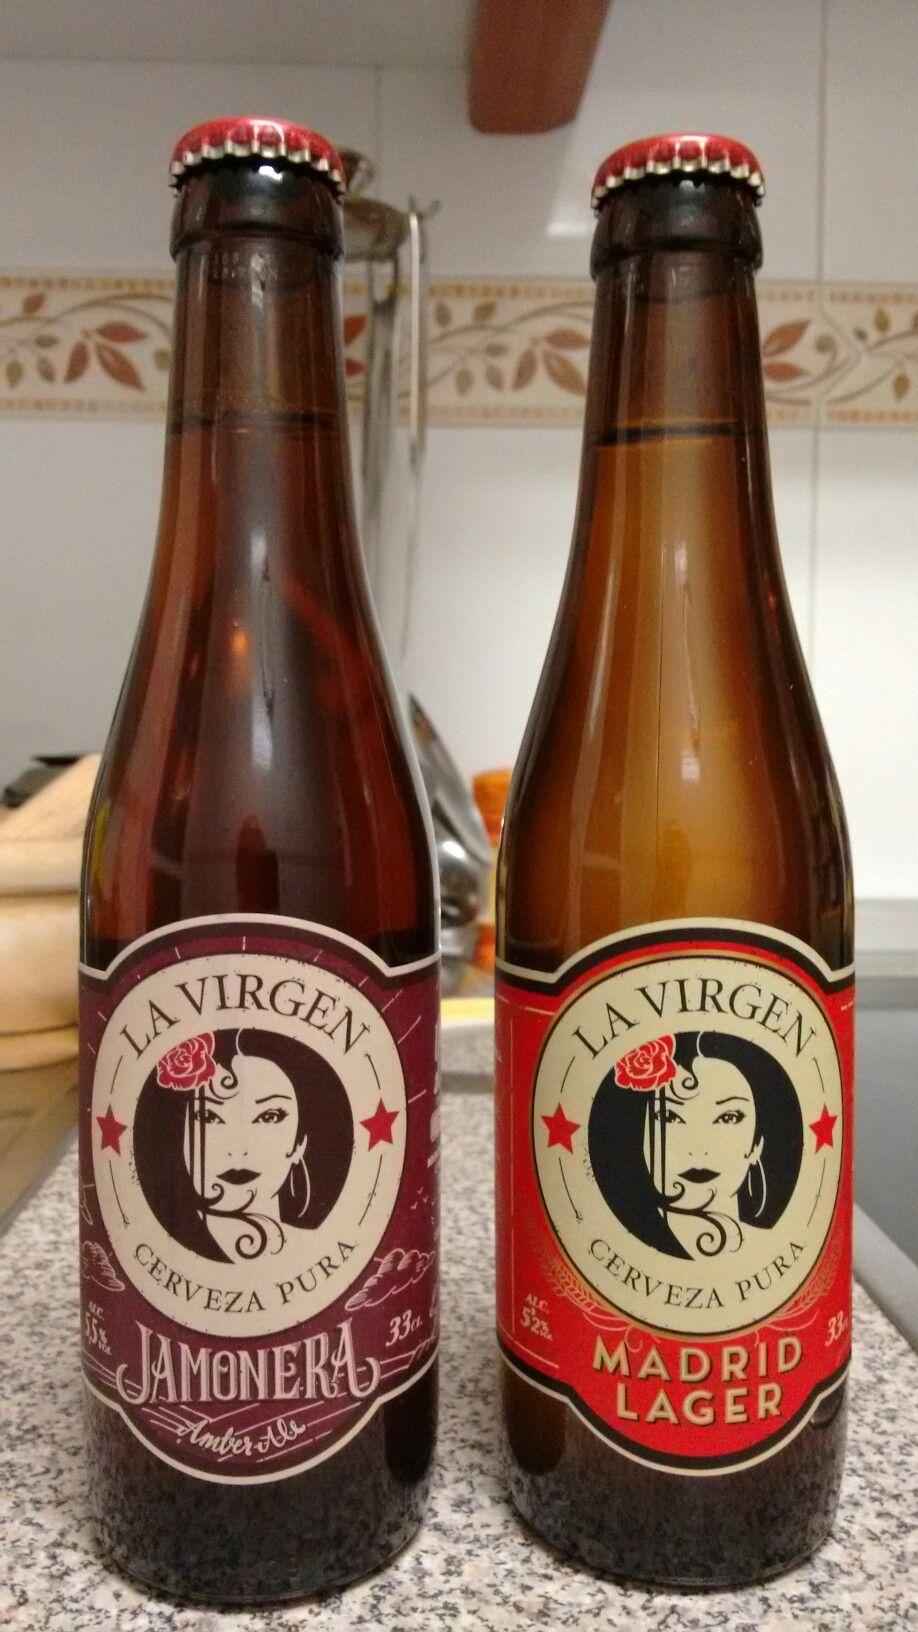 Cervezas Artesanas La Virgen Madrid Lager Y Jamonera Cerveja